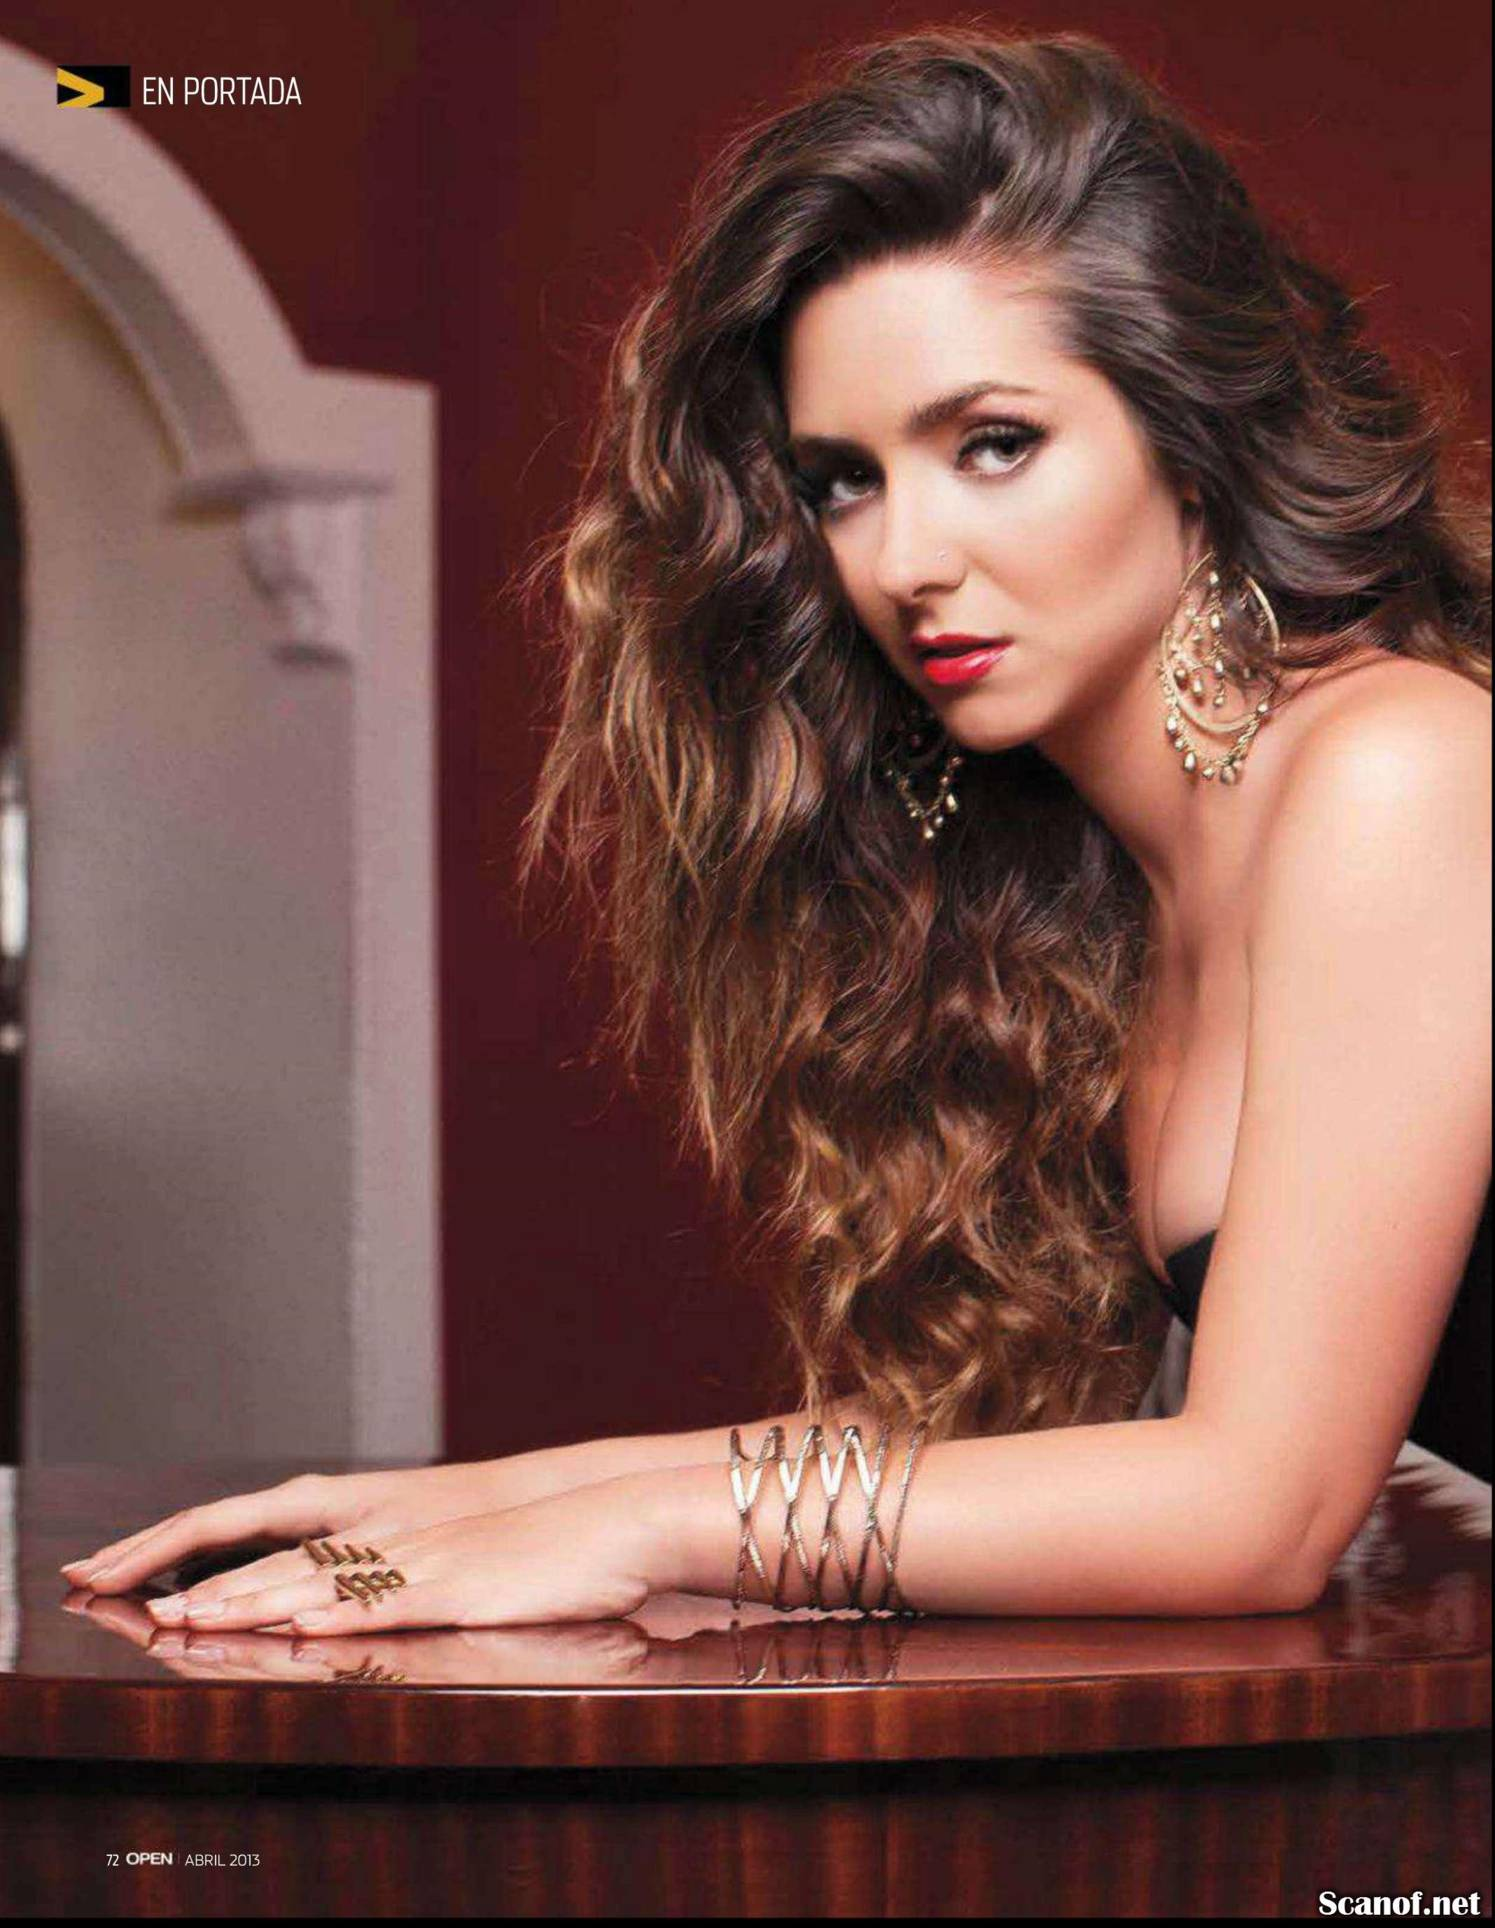 Ariadne Diaz Pics ariadne diaz - open mx magazine -02 | gotceleb